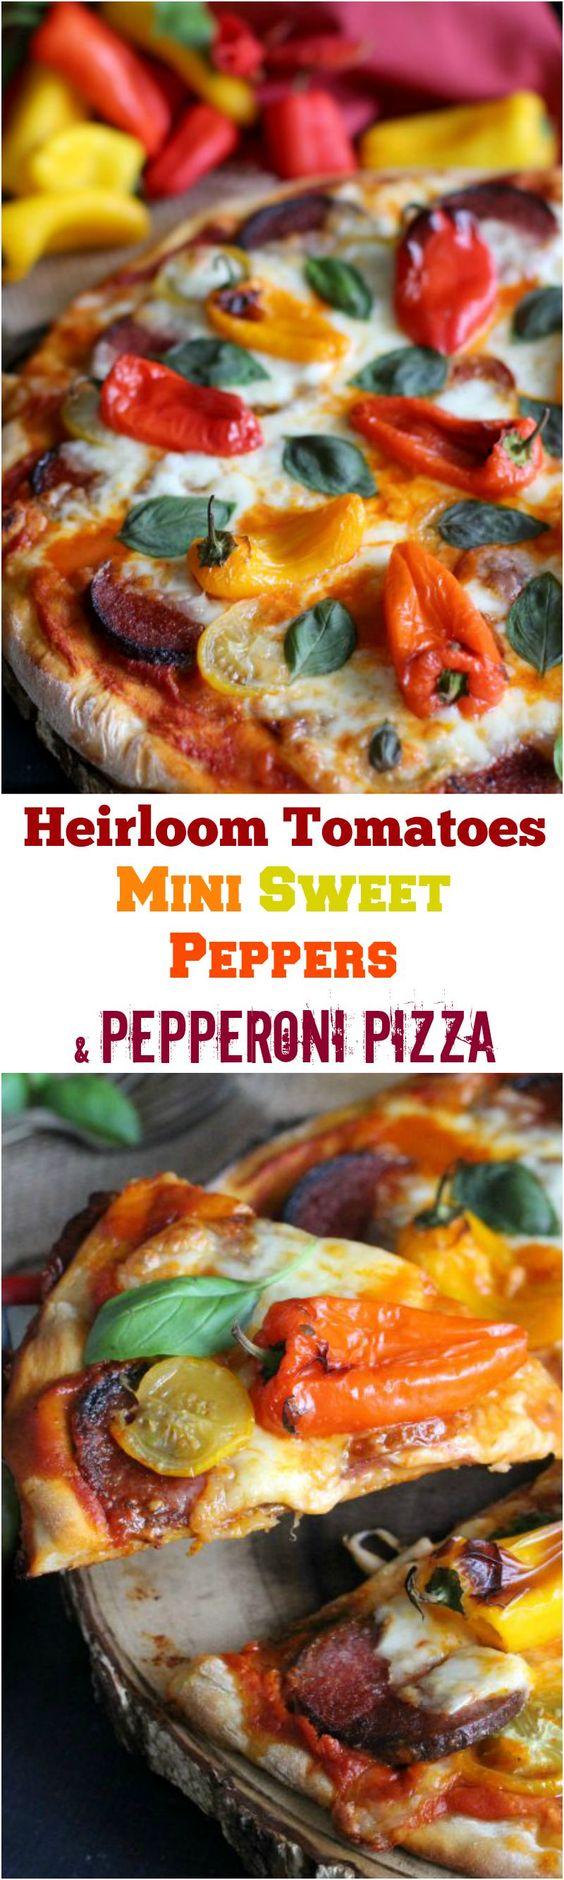 ... Basil Pizza | Recipe | Mini Sweet Peppers, Heirloom Tomatoes and Basil